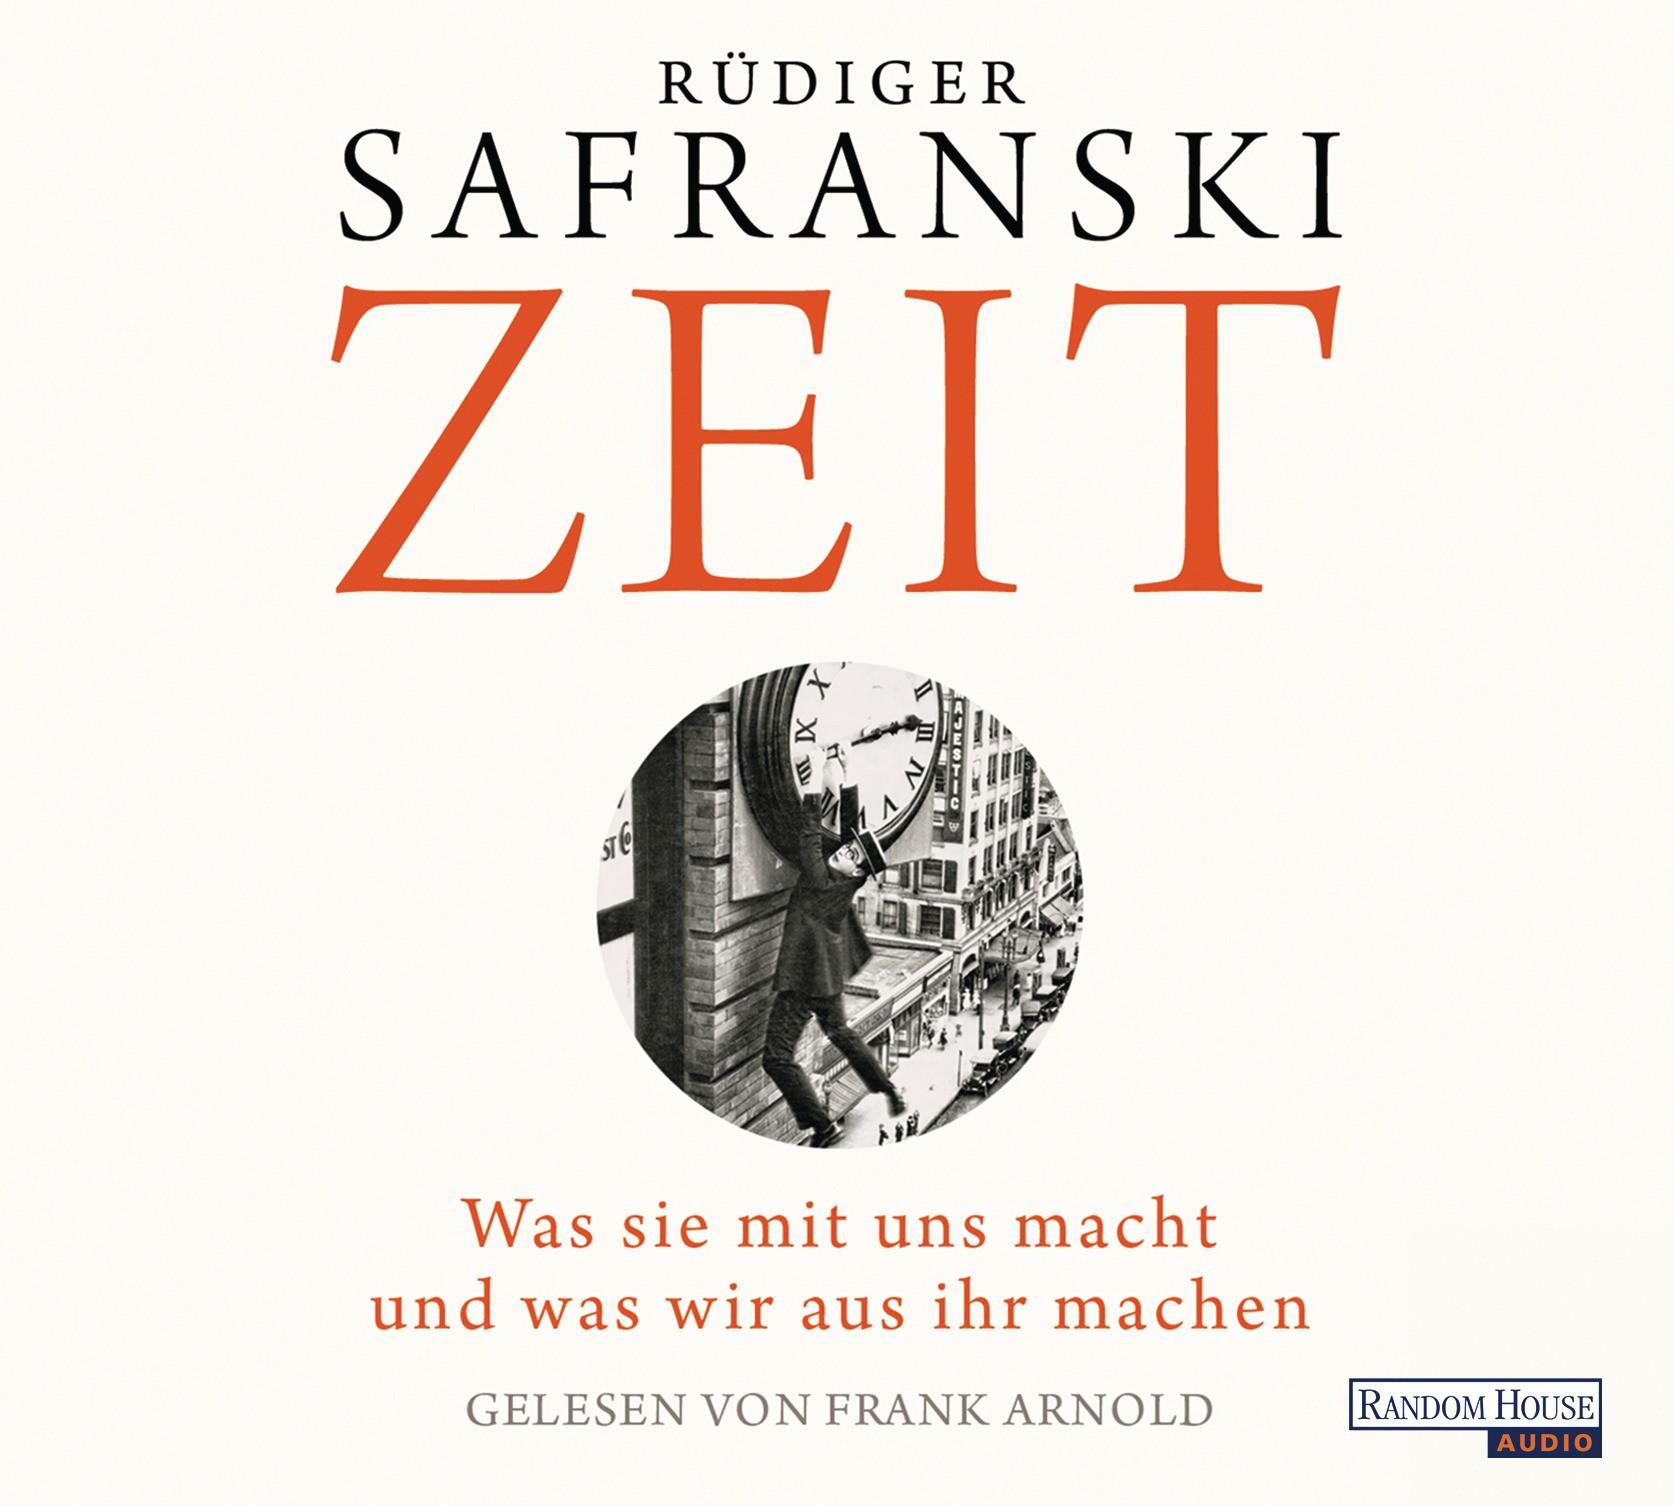 Rüdiger Safranski - Zeit